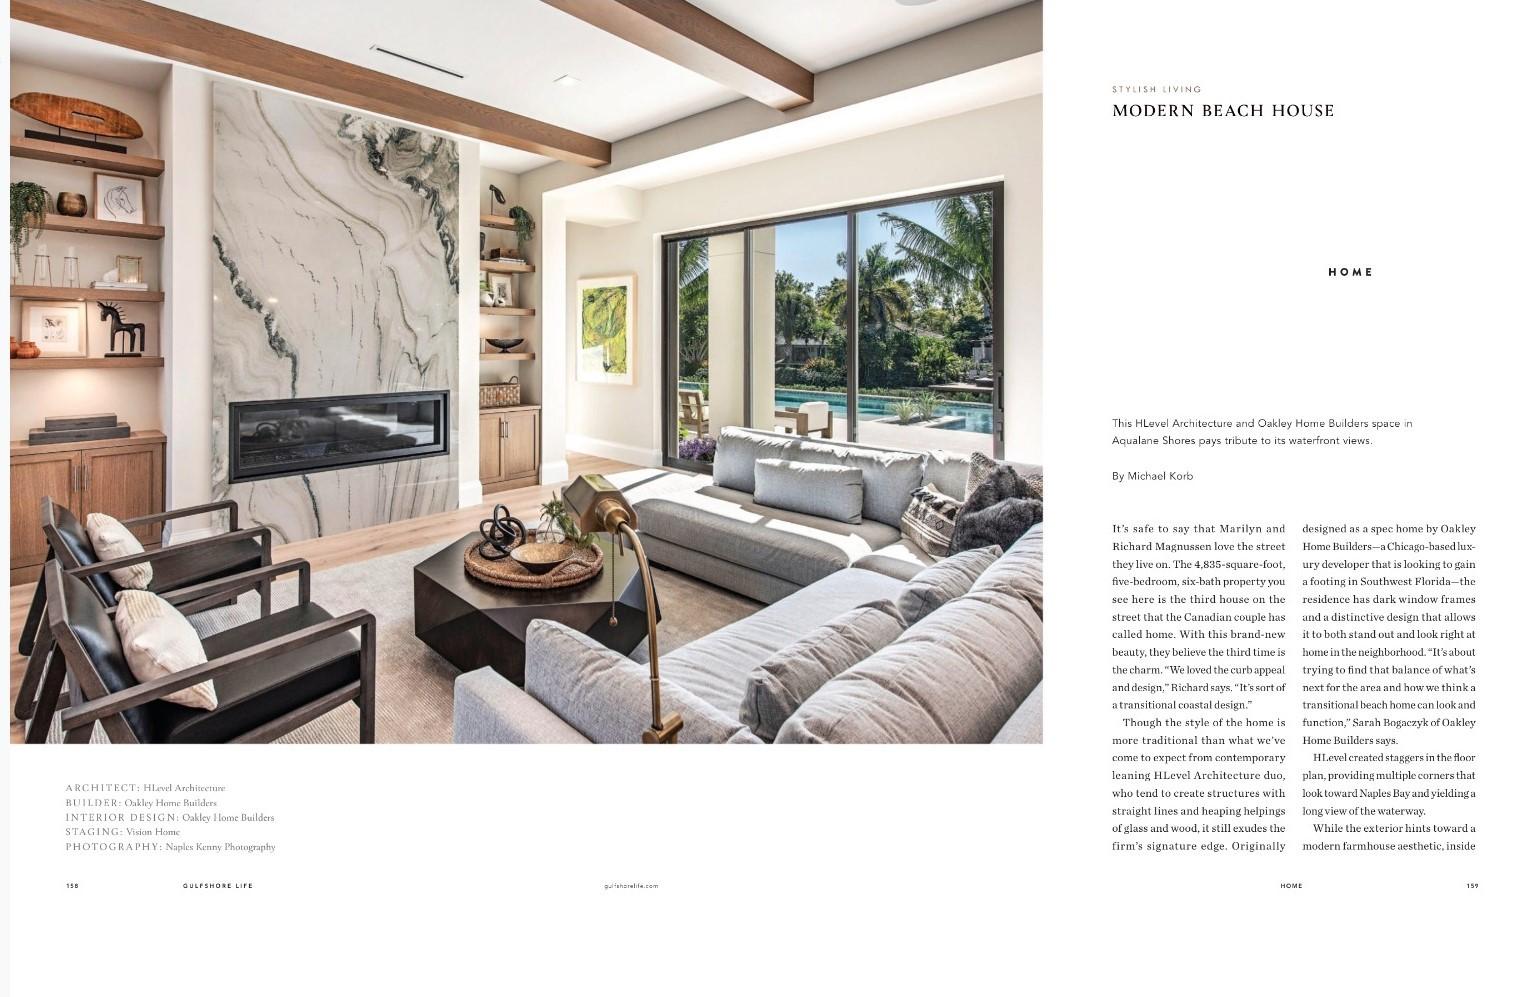 Gulfshore Life Magazine and Hlevel Architecture